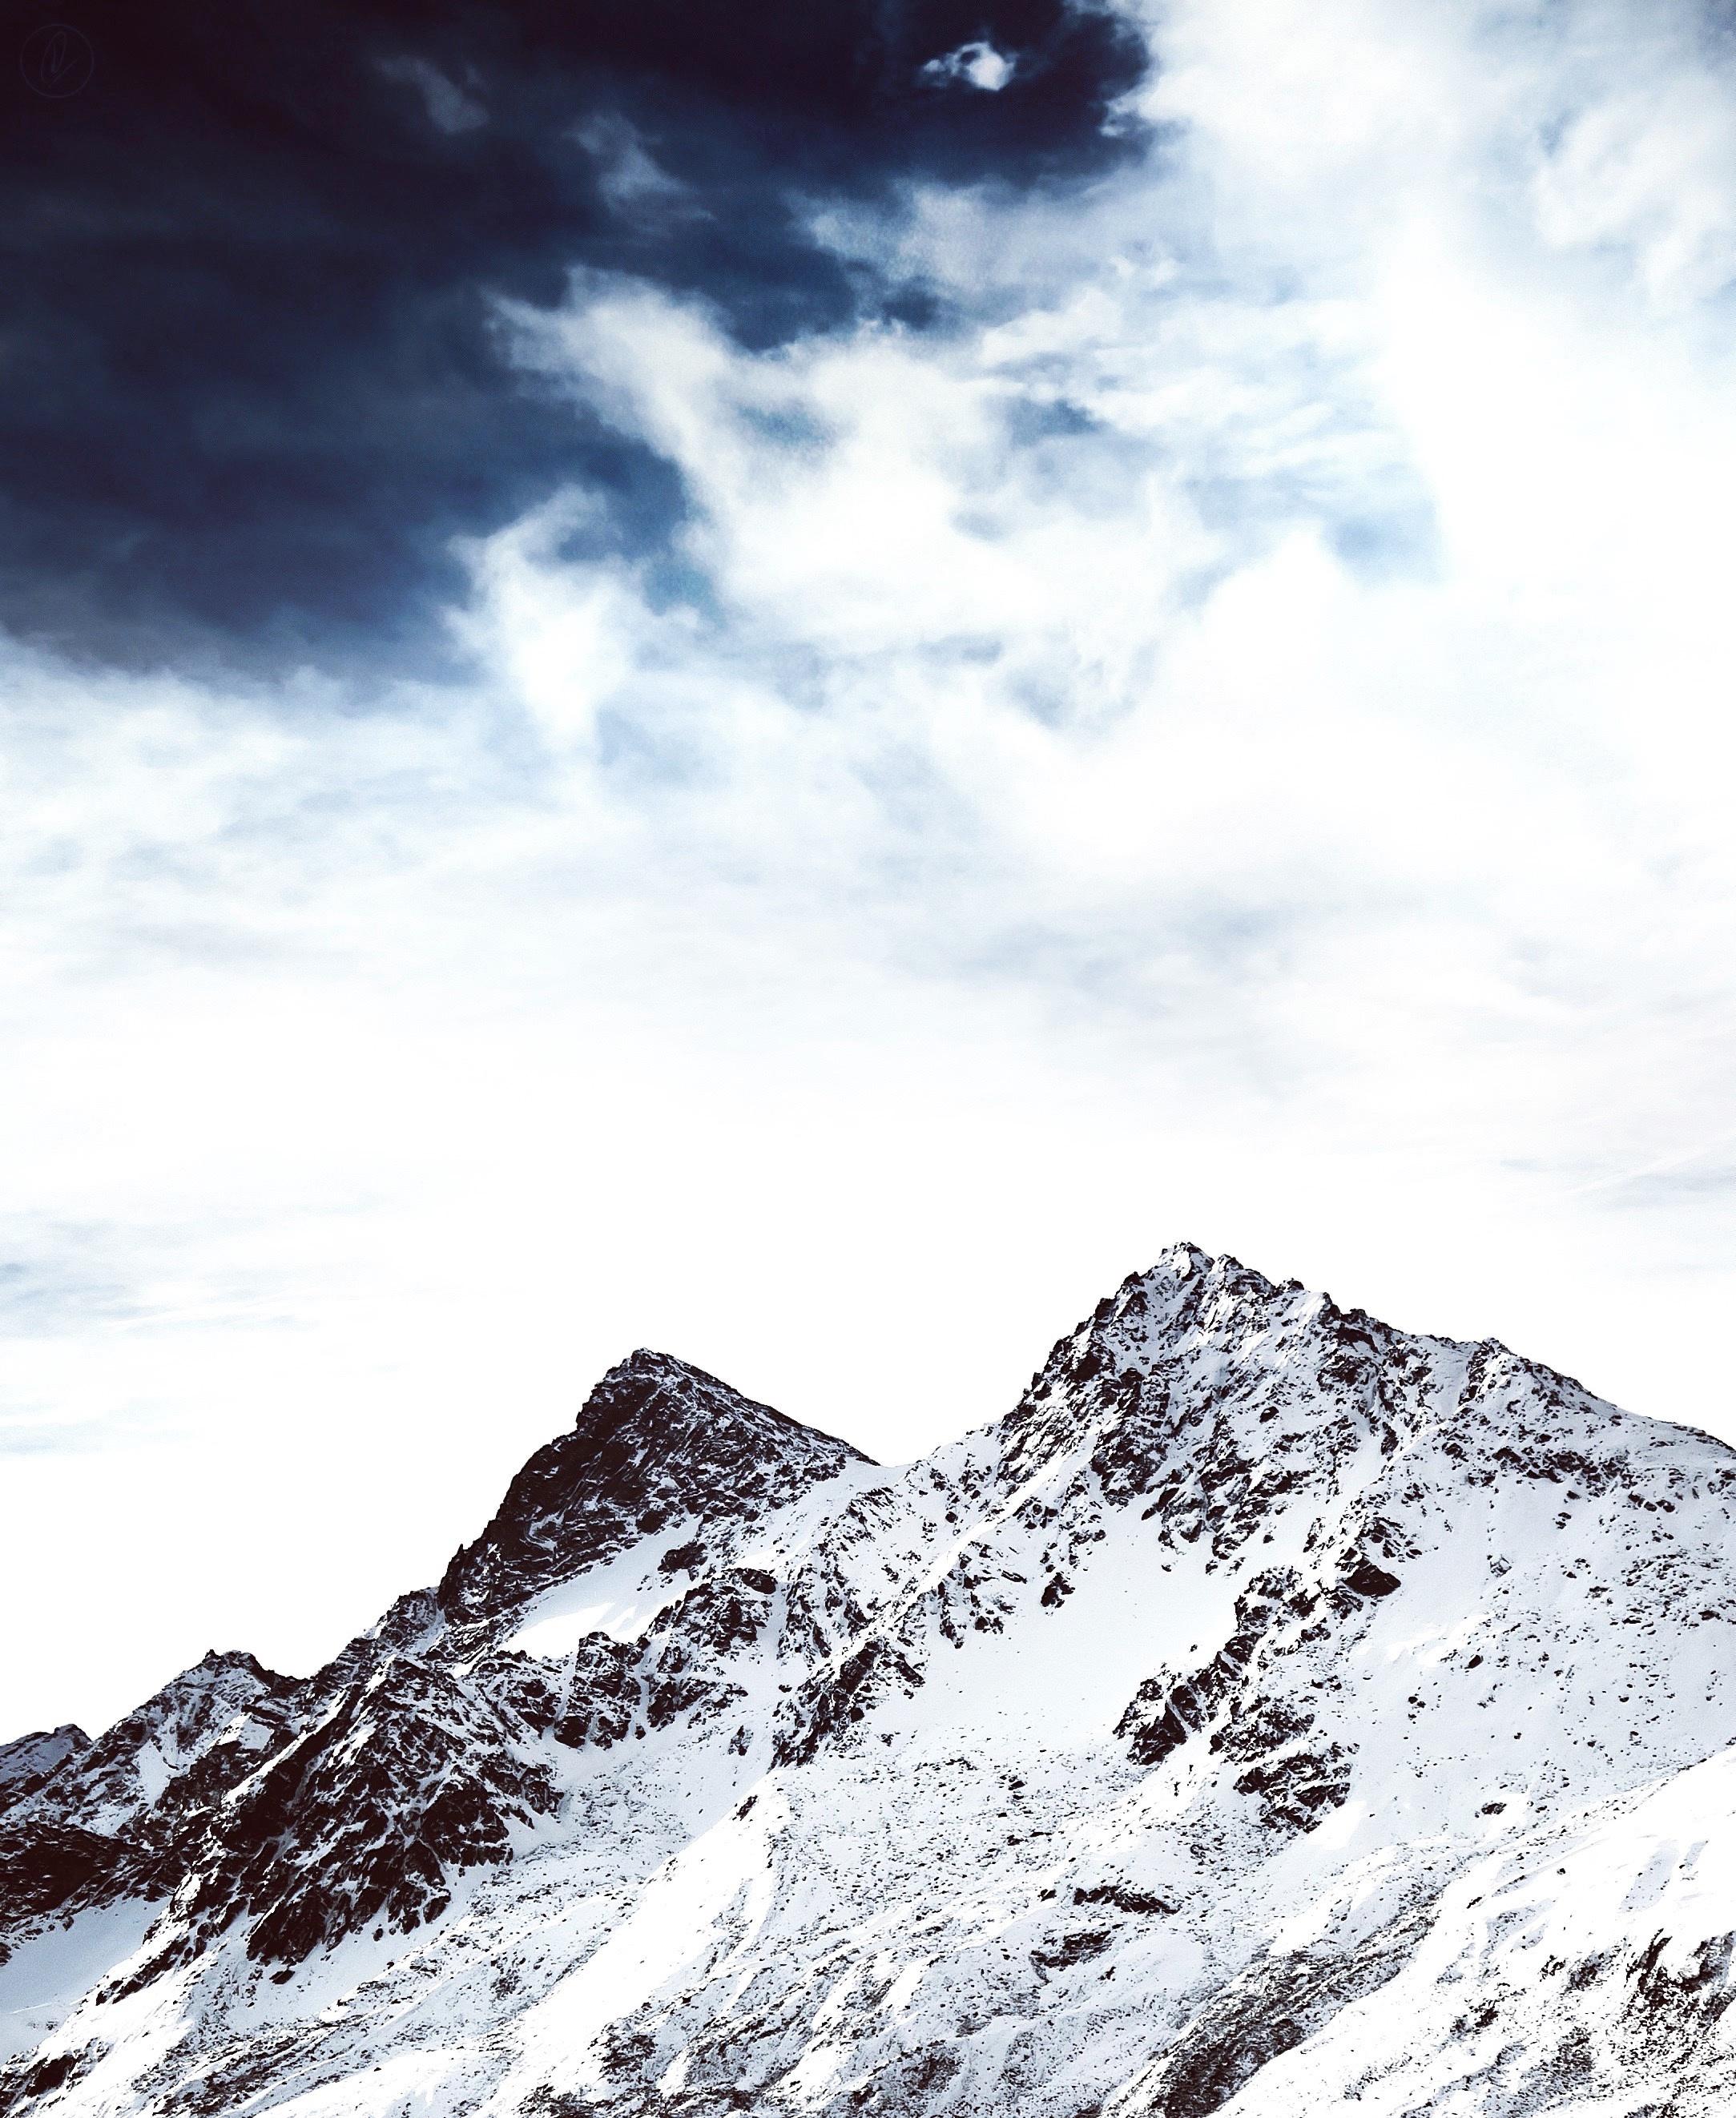 Gambar Gunung Salju Musim Dingin Awan Langit Puncak Pegunungan Alpine Punggung Bukit Pegunungan Alpen Dataran Landform Fitur Geografis Bentang Alam Pegunungan Fenomena Geologi 2167x2644 1141858 Galeri Foto Pxhere